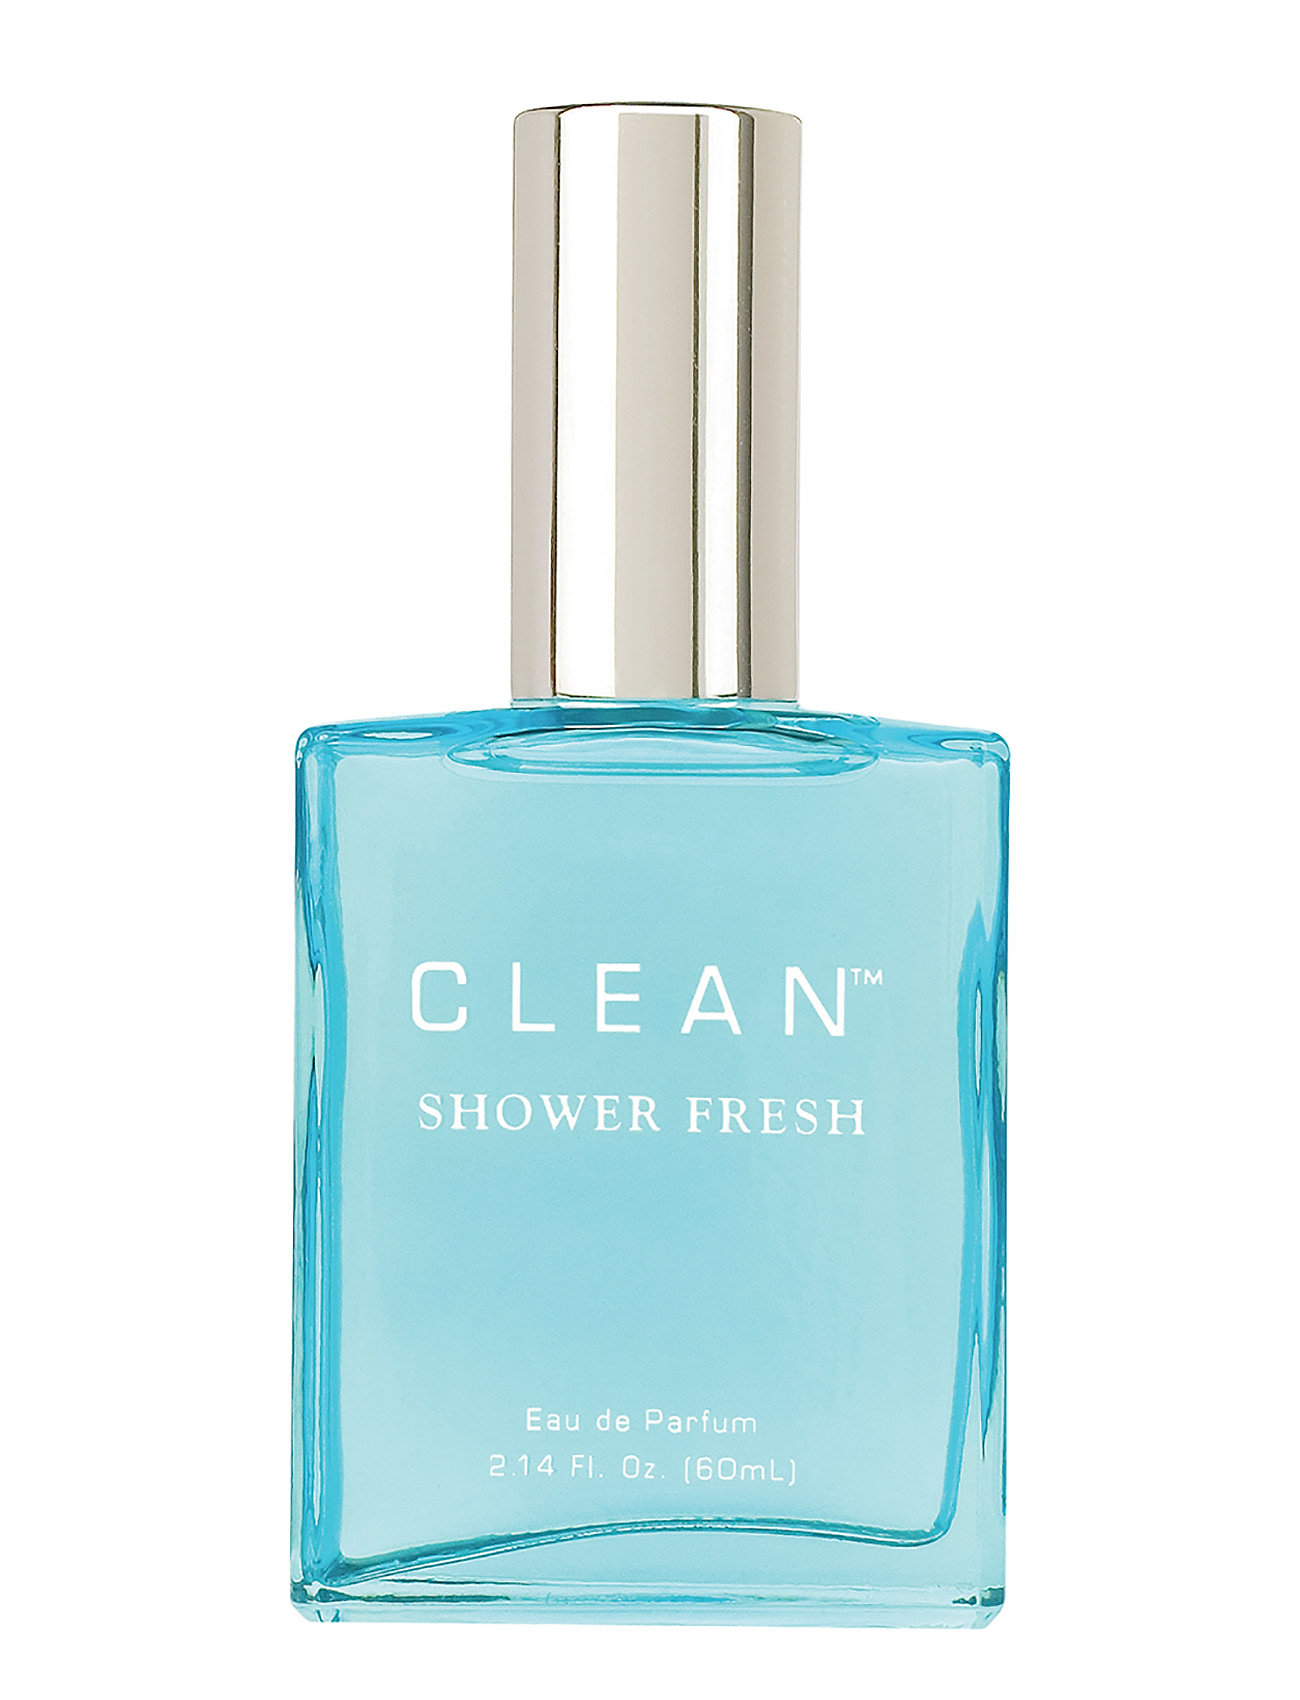 clean – Shower fresh fra boozt.com dk